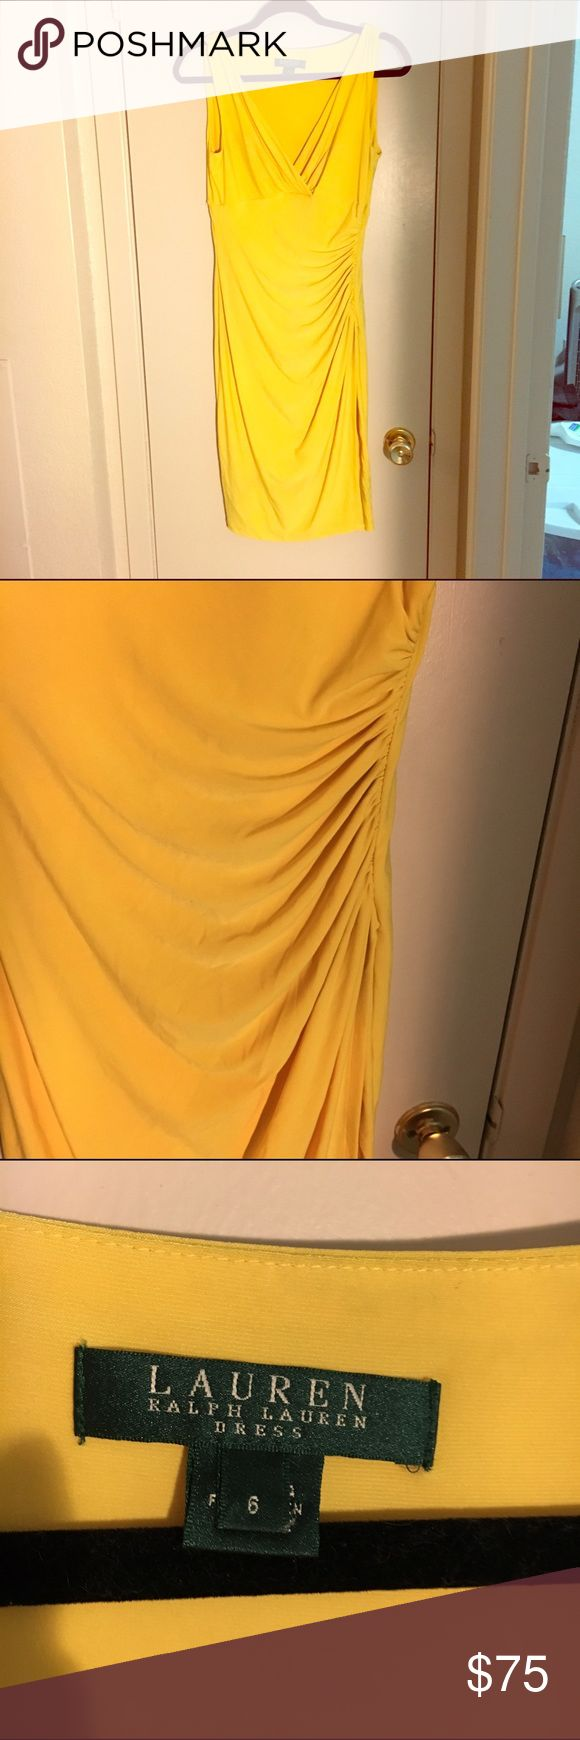 Lauren Ralph Lauren dress Sleeveless yellow cocktail dress by Lauren Ralph Lauren. Cinched on the side. Lauren Ralph Lauren Dresses